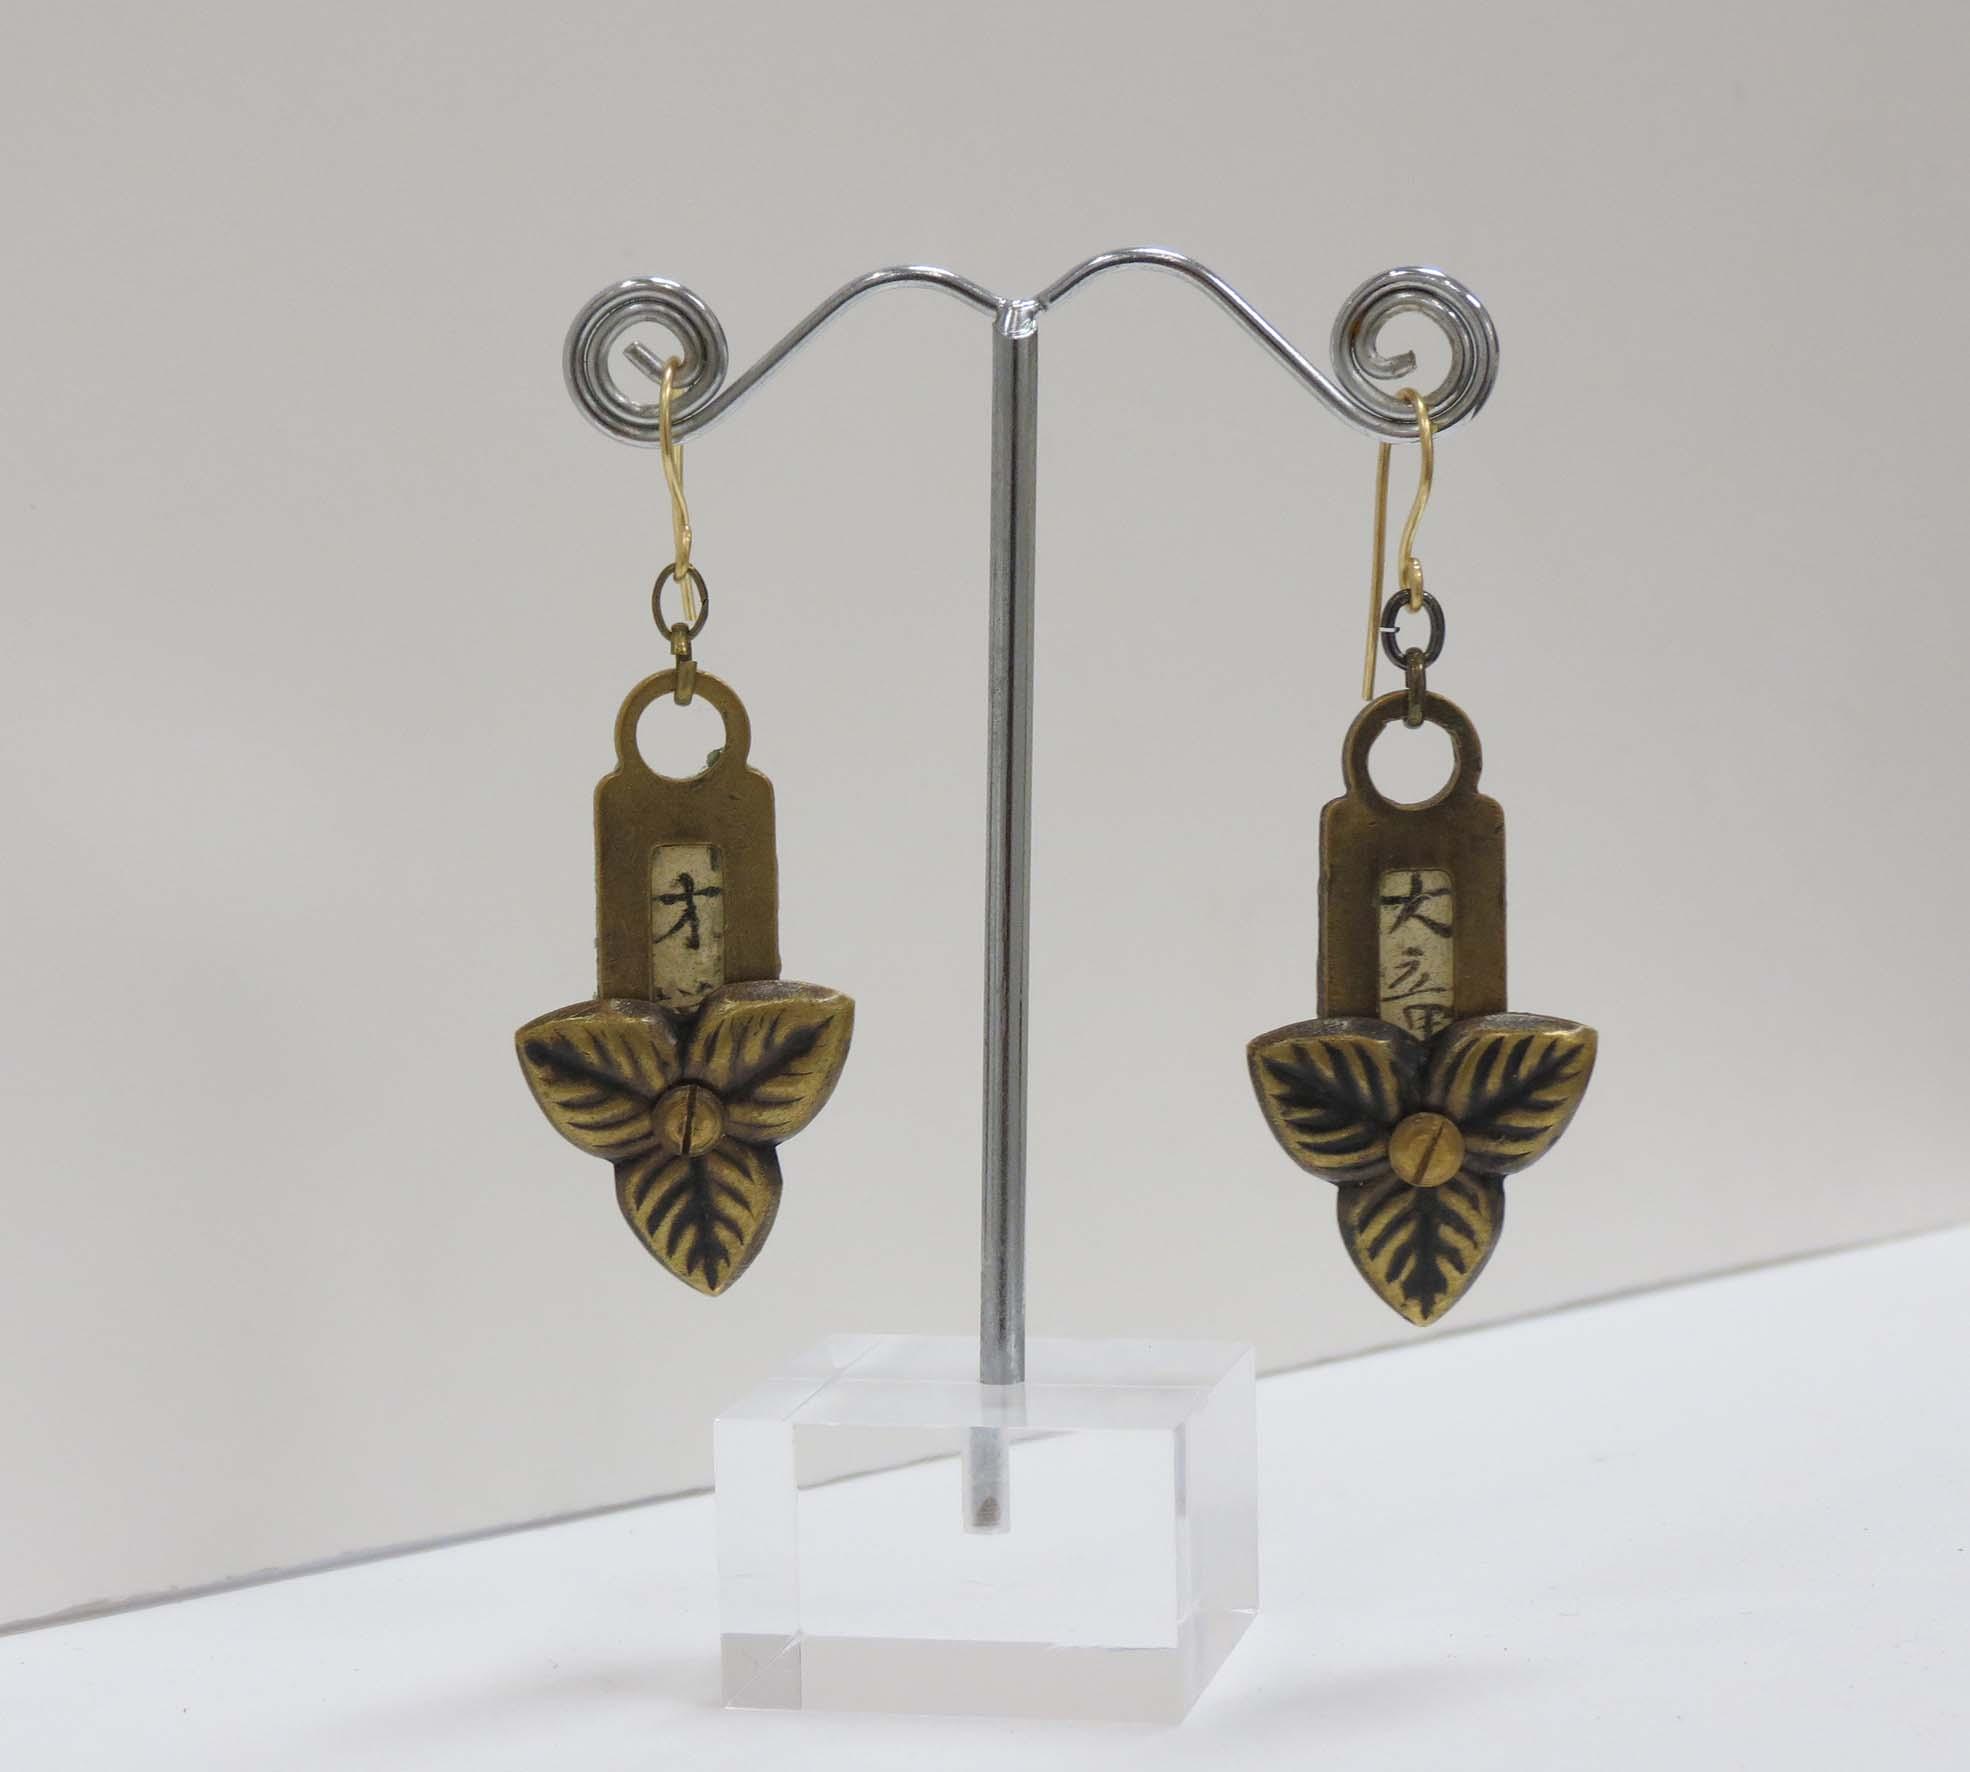 18. Kathy Aspinall, 'Brass', 2017, brass, Japanese paper, resin, earrings, $175